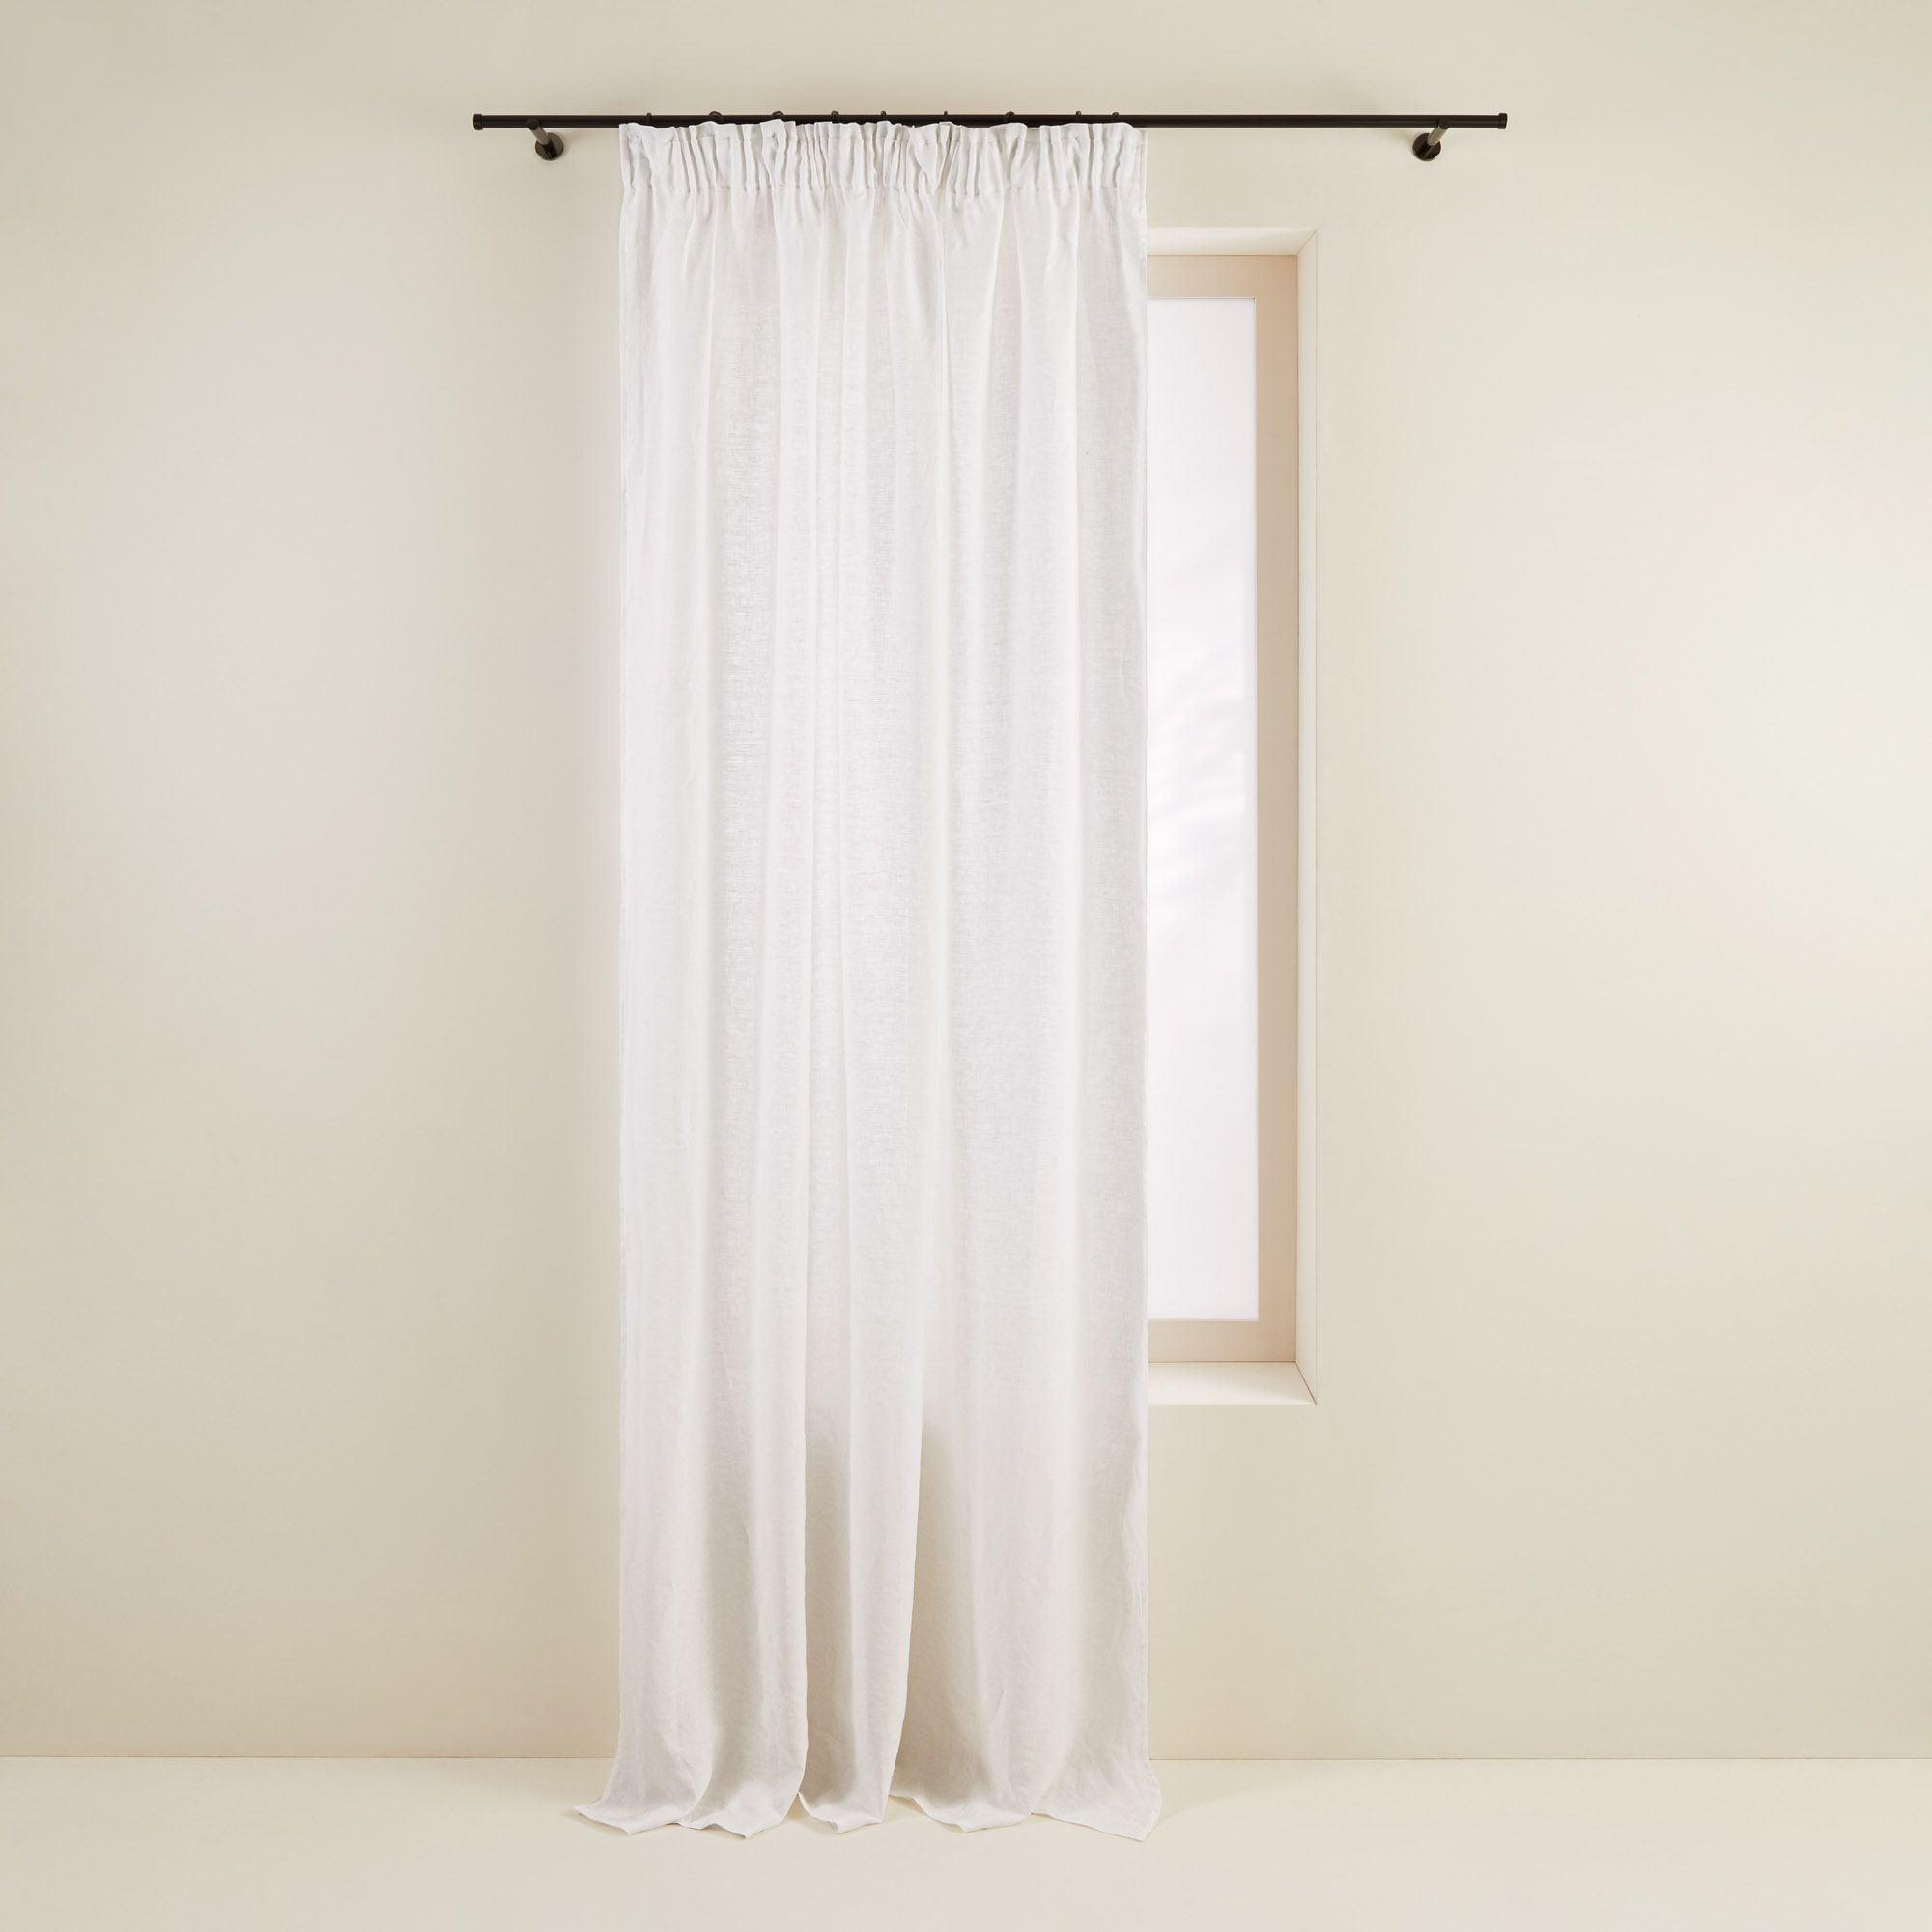 Rideau à ruban fronceur 350x280 cm Blanc en Lin